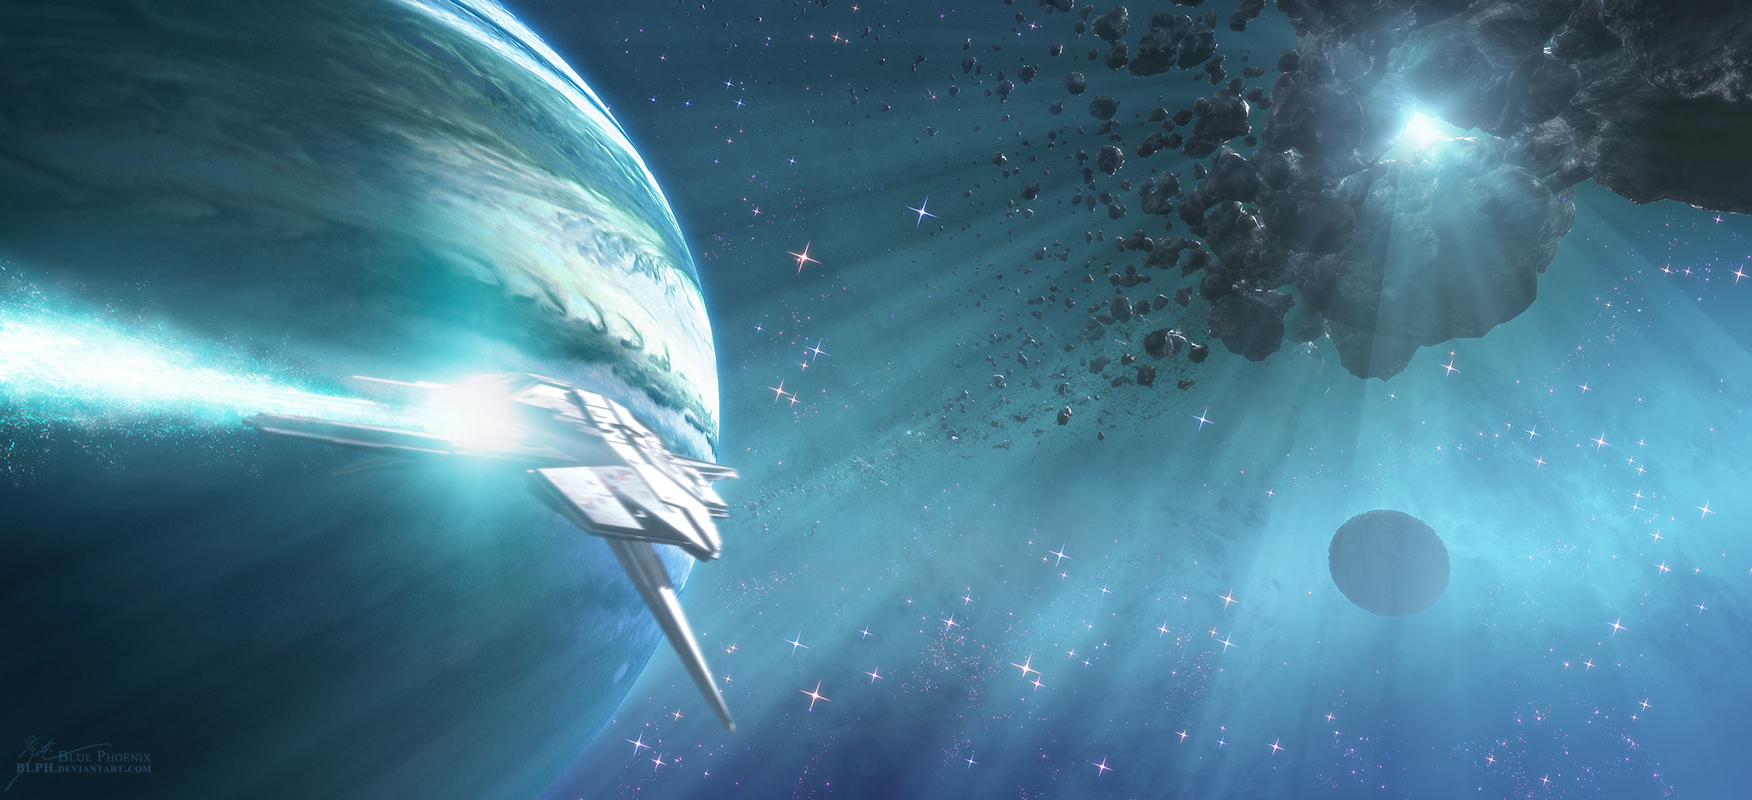 Celestial Ether